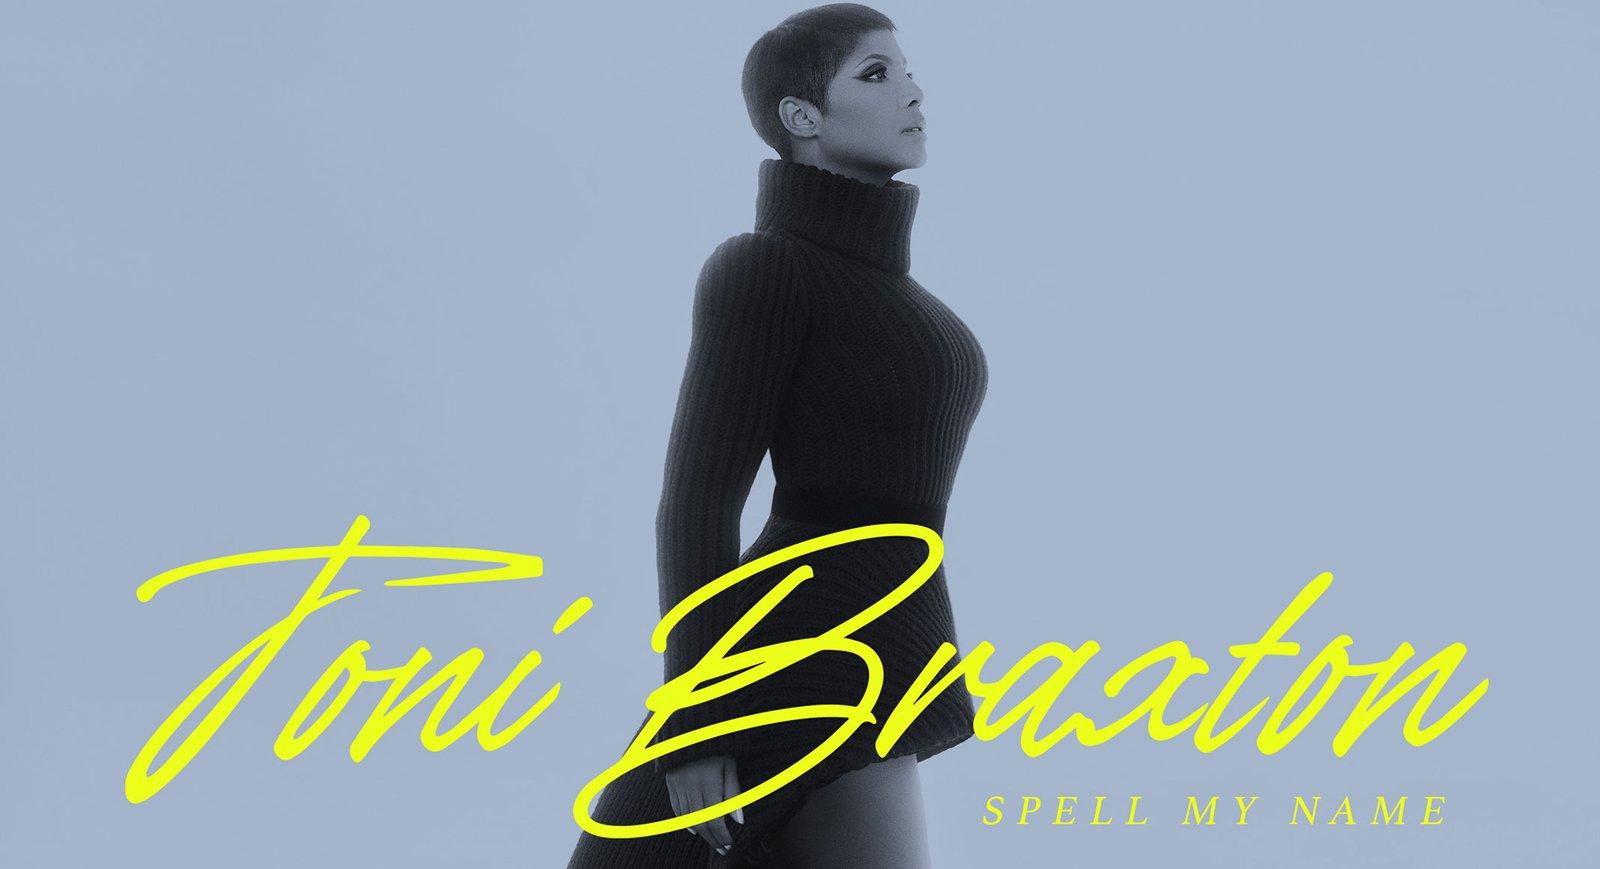 Grammy Award-winning, Multi-platinum Global Superstar Toni Braxton